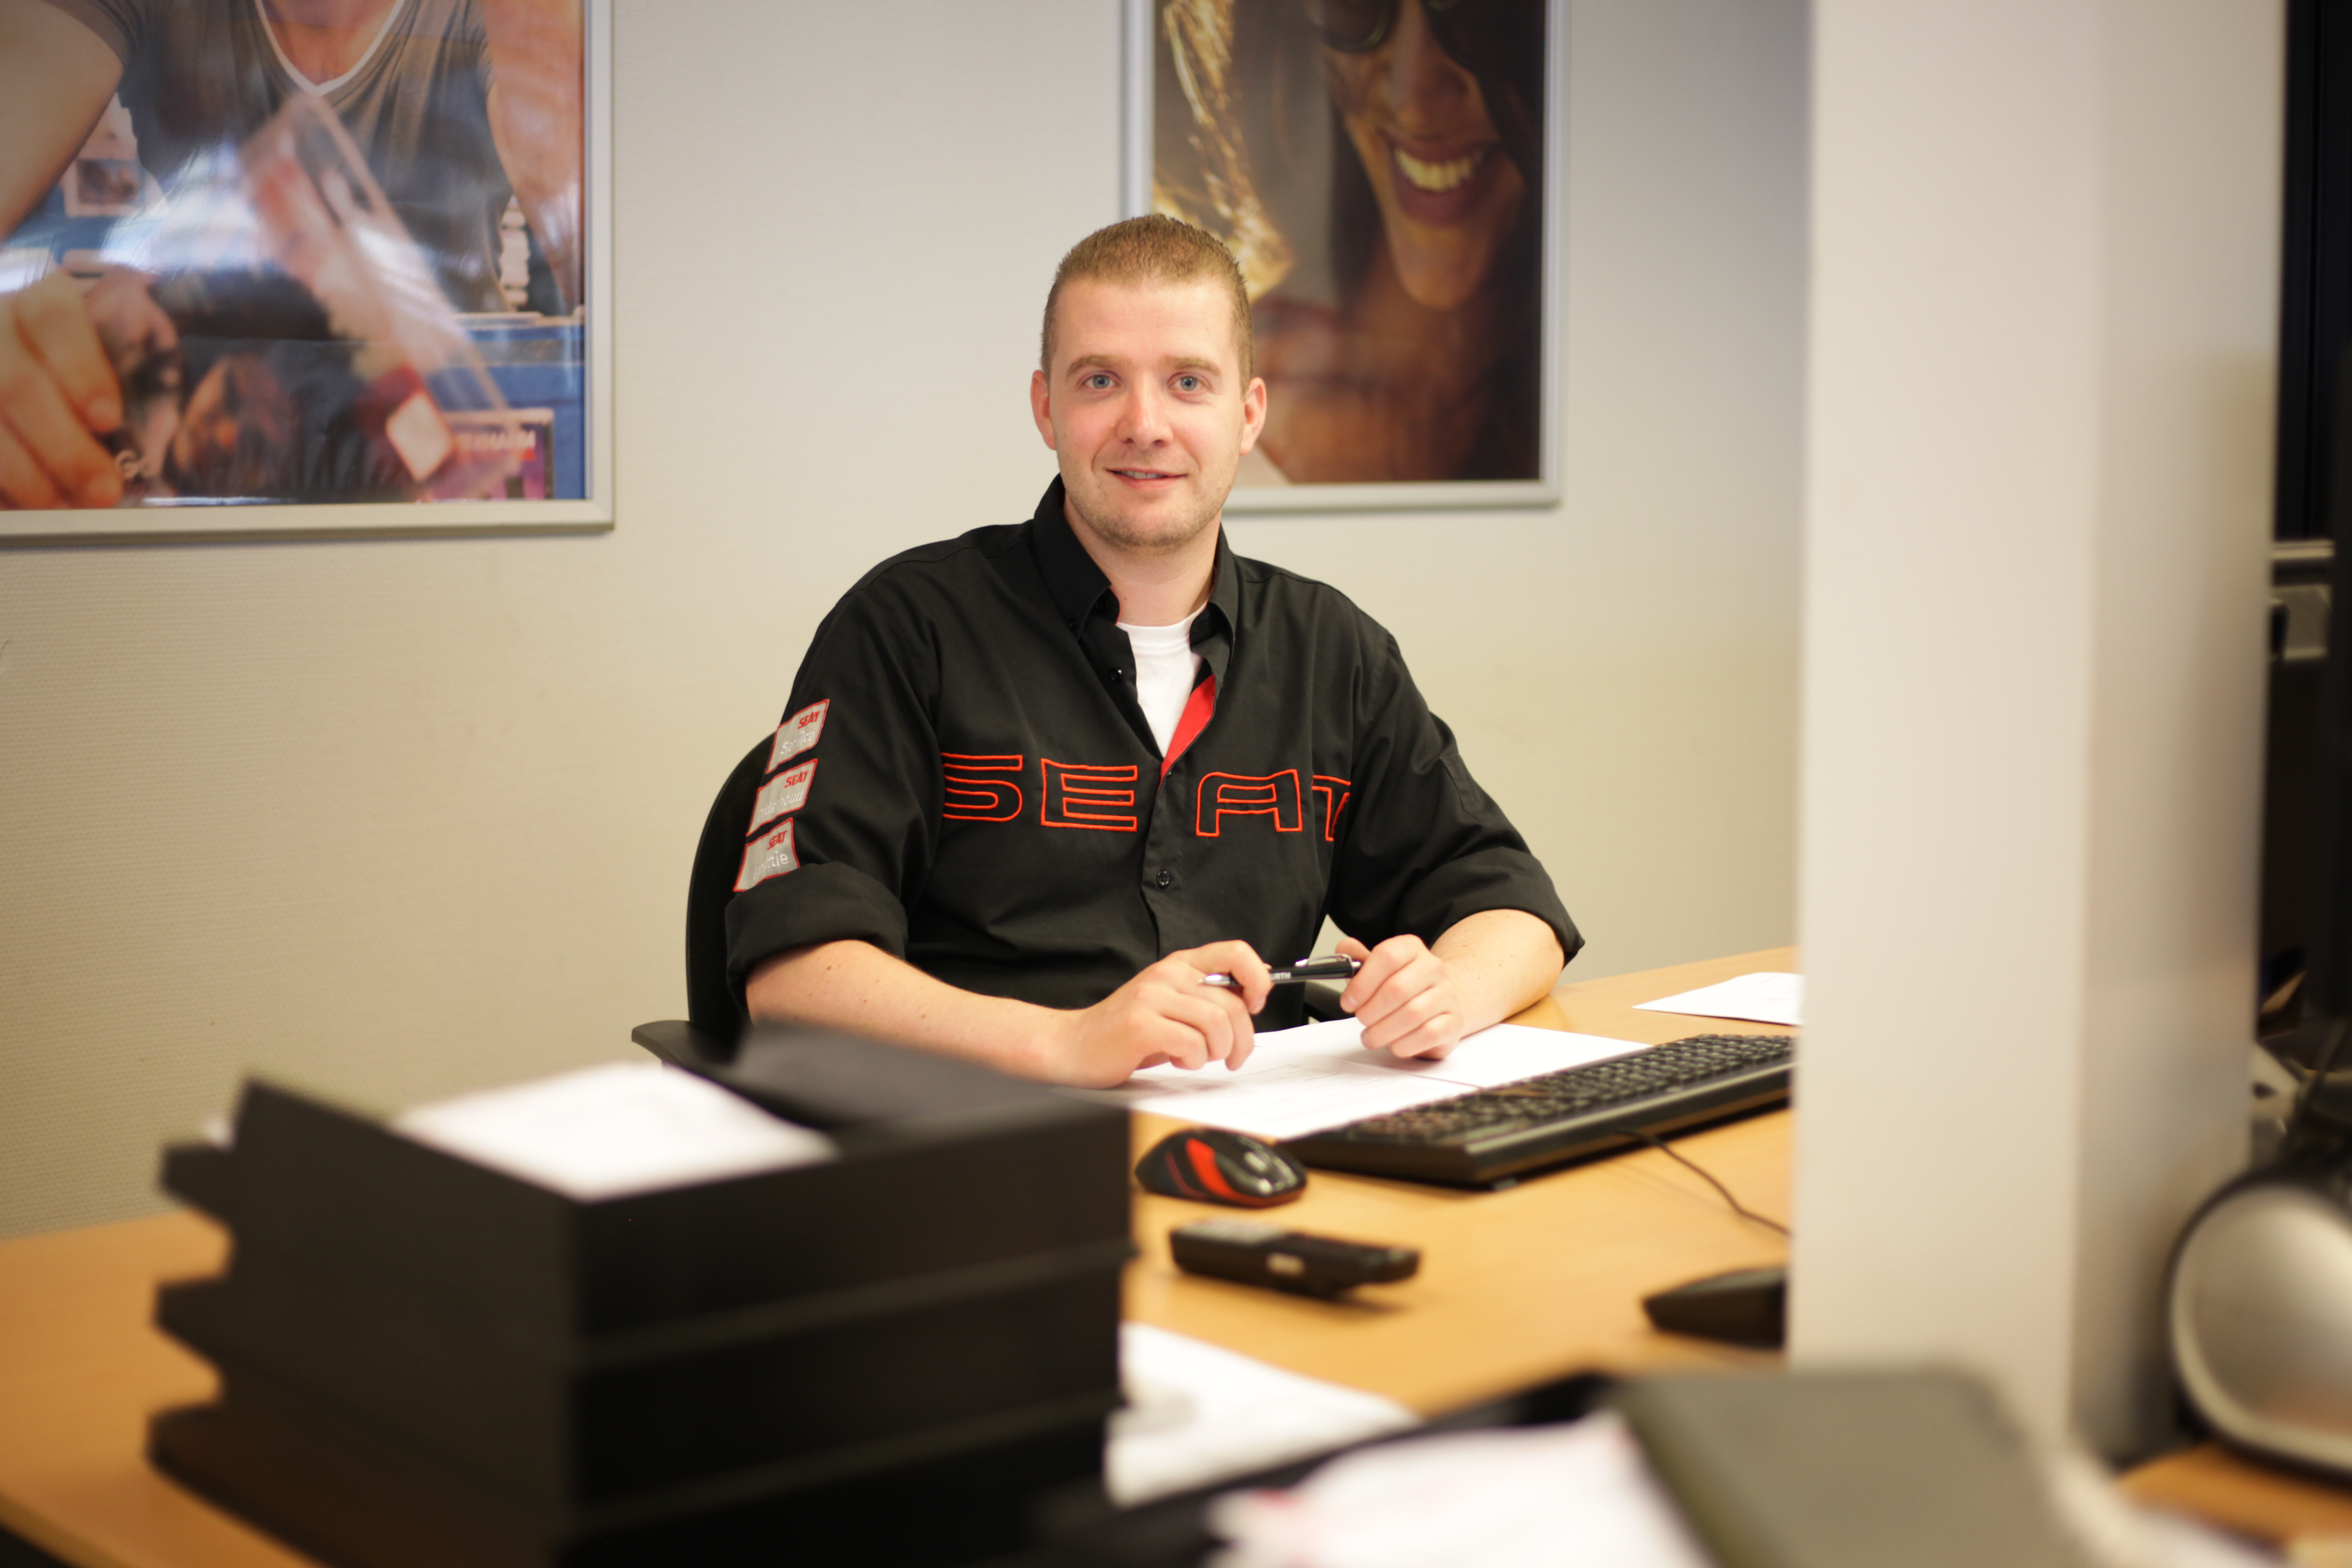 Kees Fredriks Magazijn / Service Adviseur